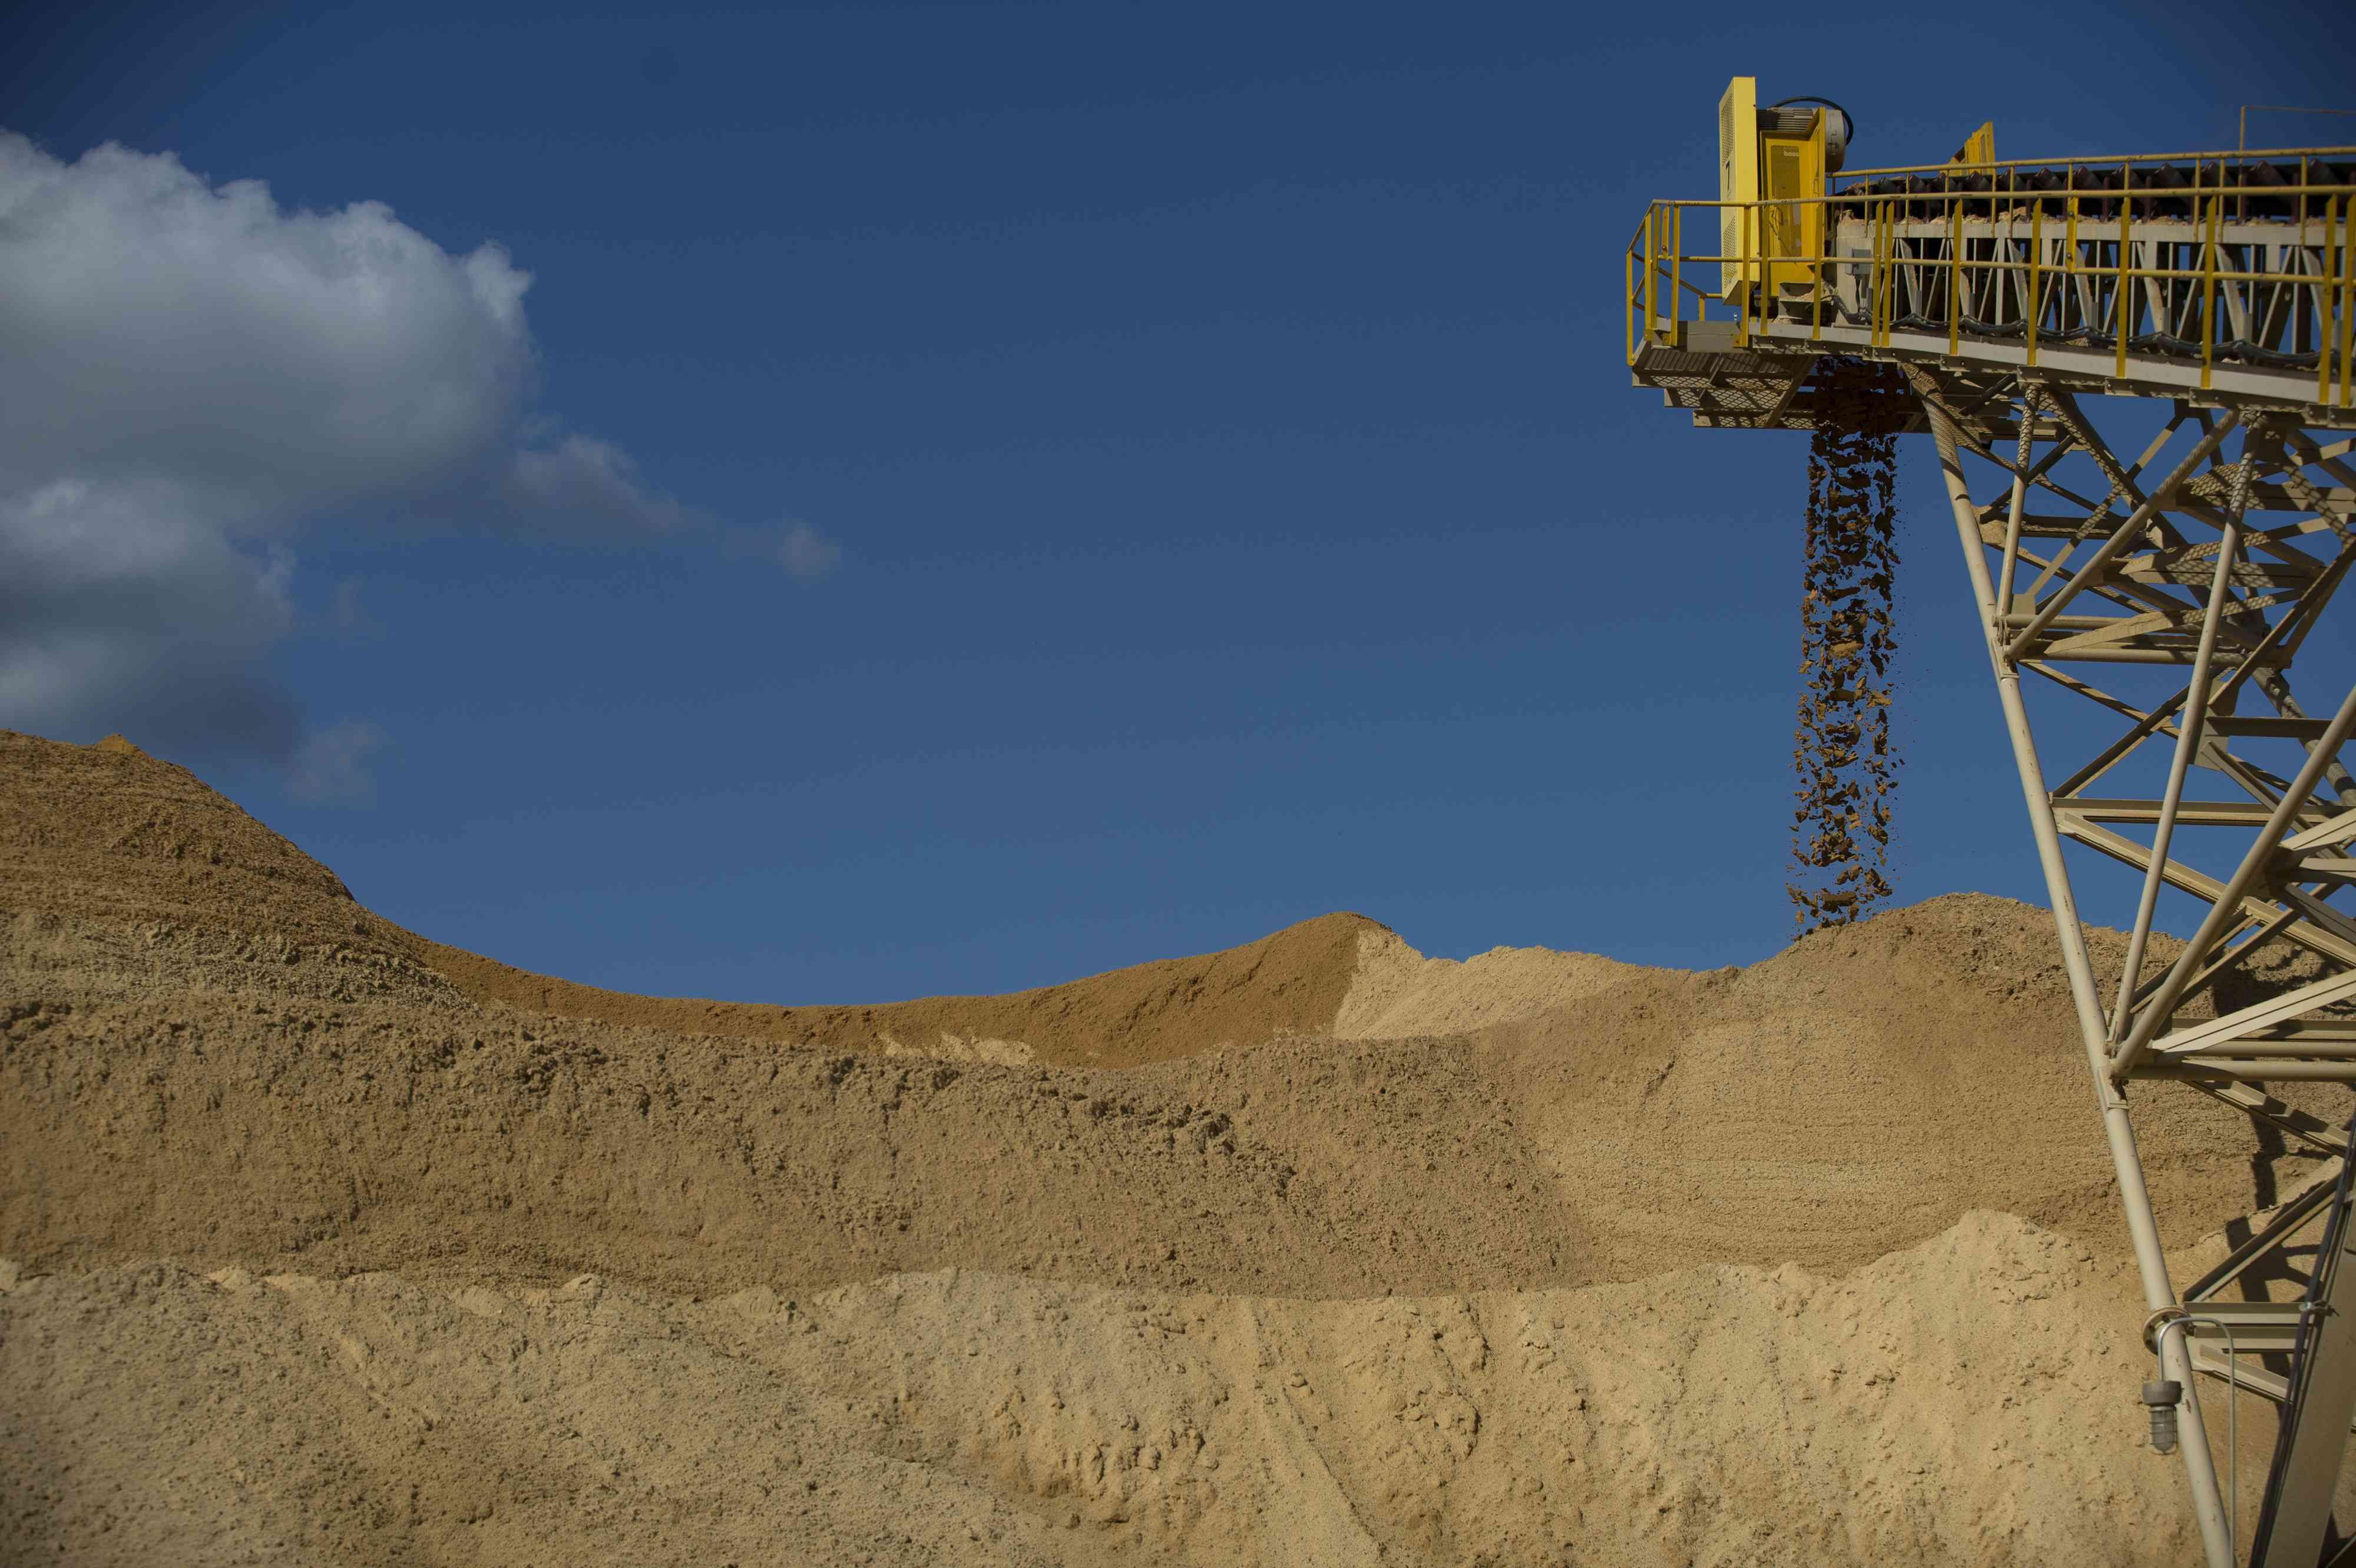 A conveyor belt dumps raw sand into a pile